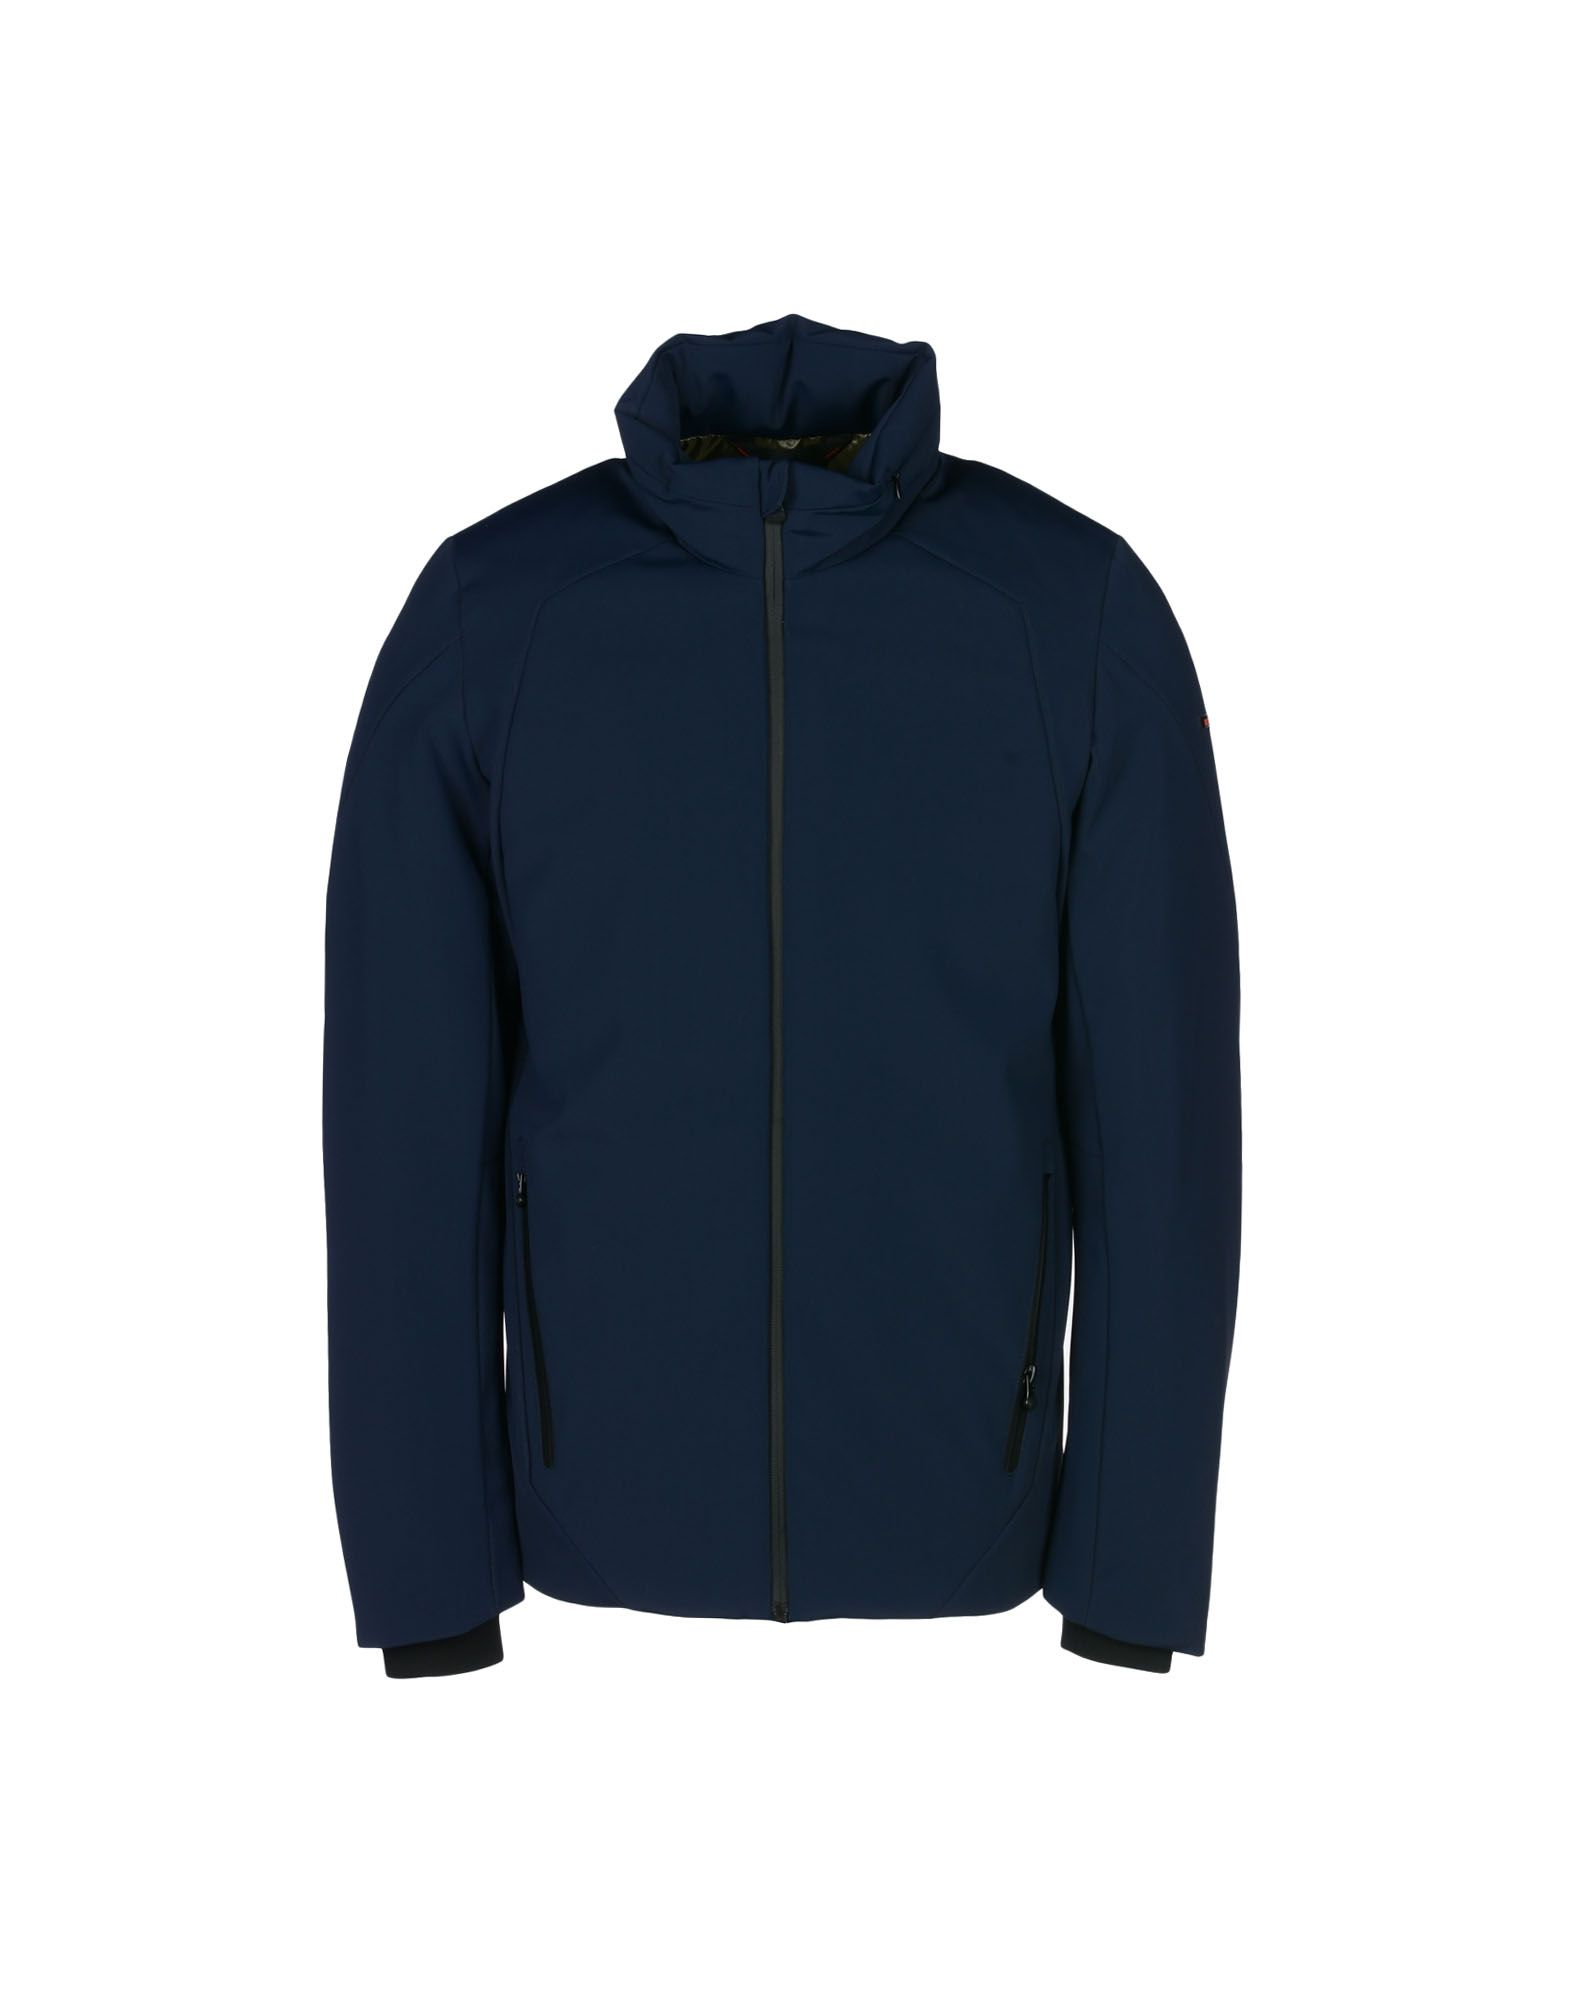 Piumino Rh+ Morphic Jacket - Uomo - Acquista online su